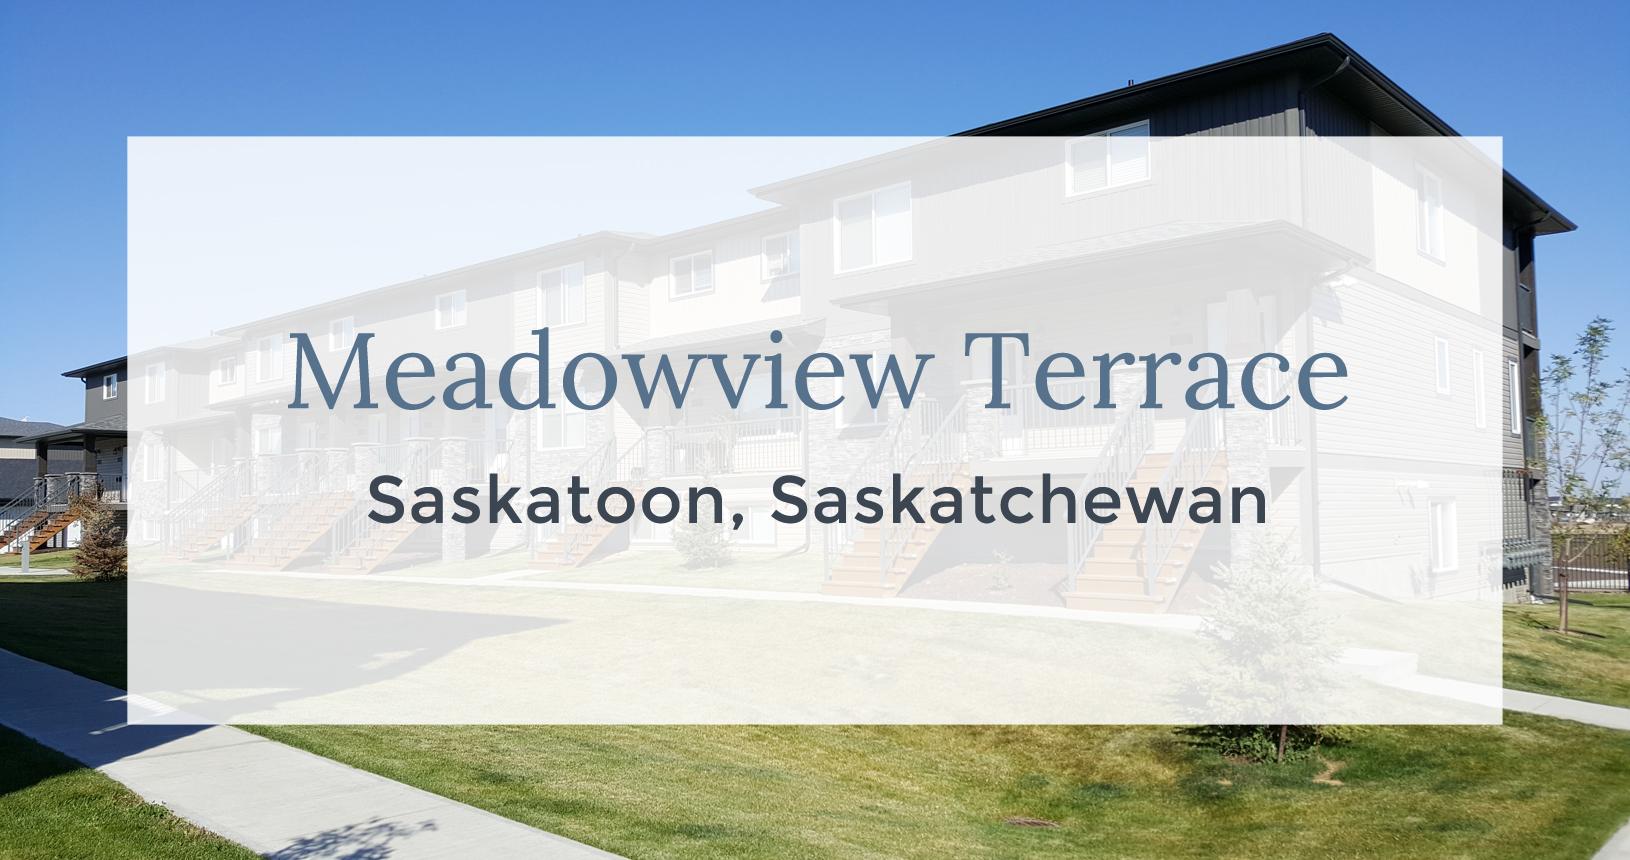 Meadowview Terrace: Saskatoon, Sashatchewan